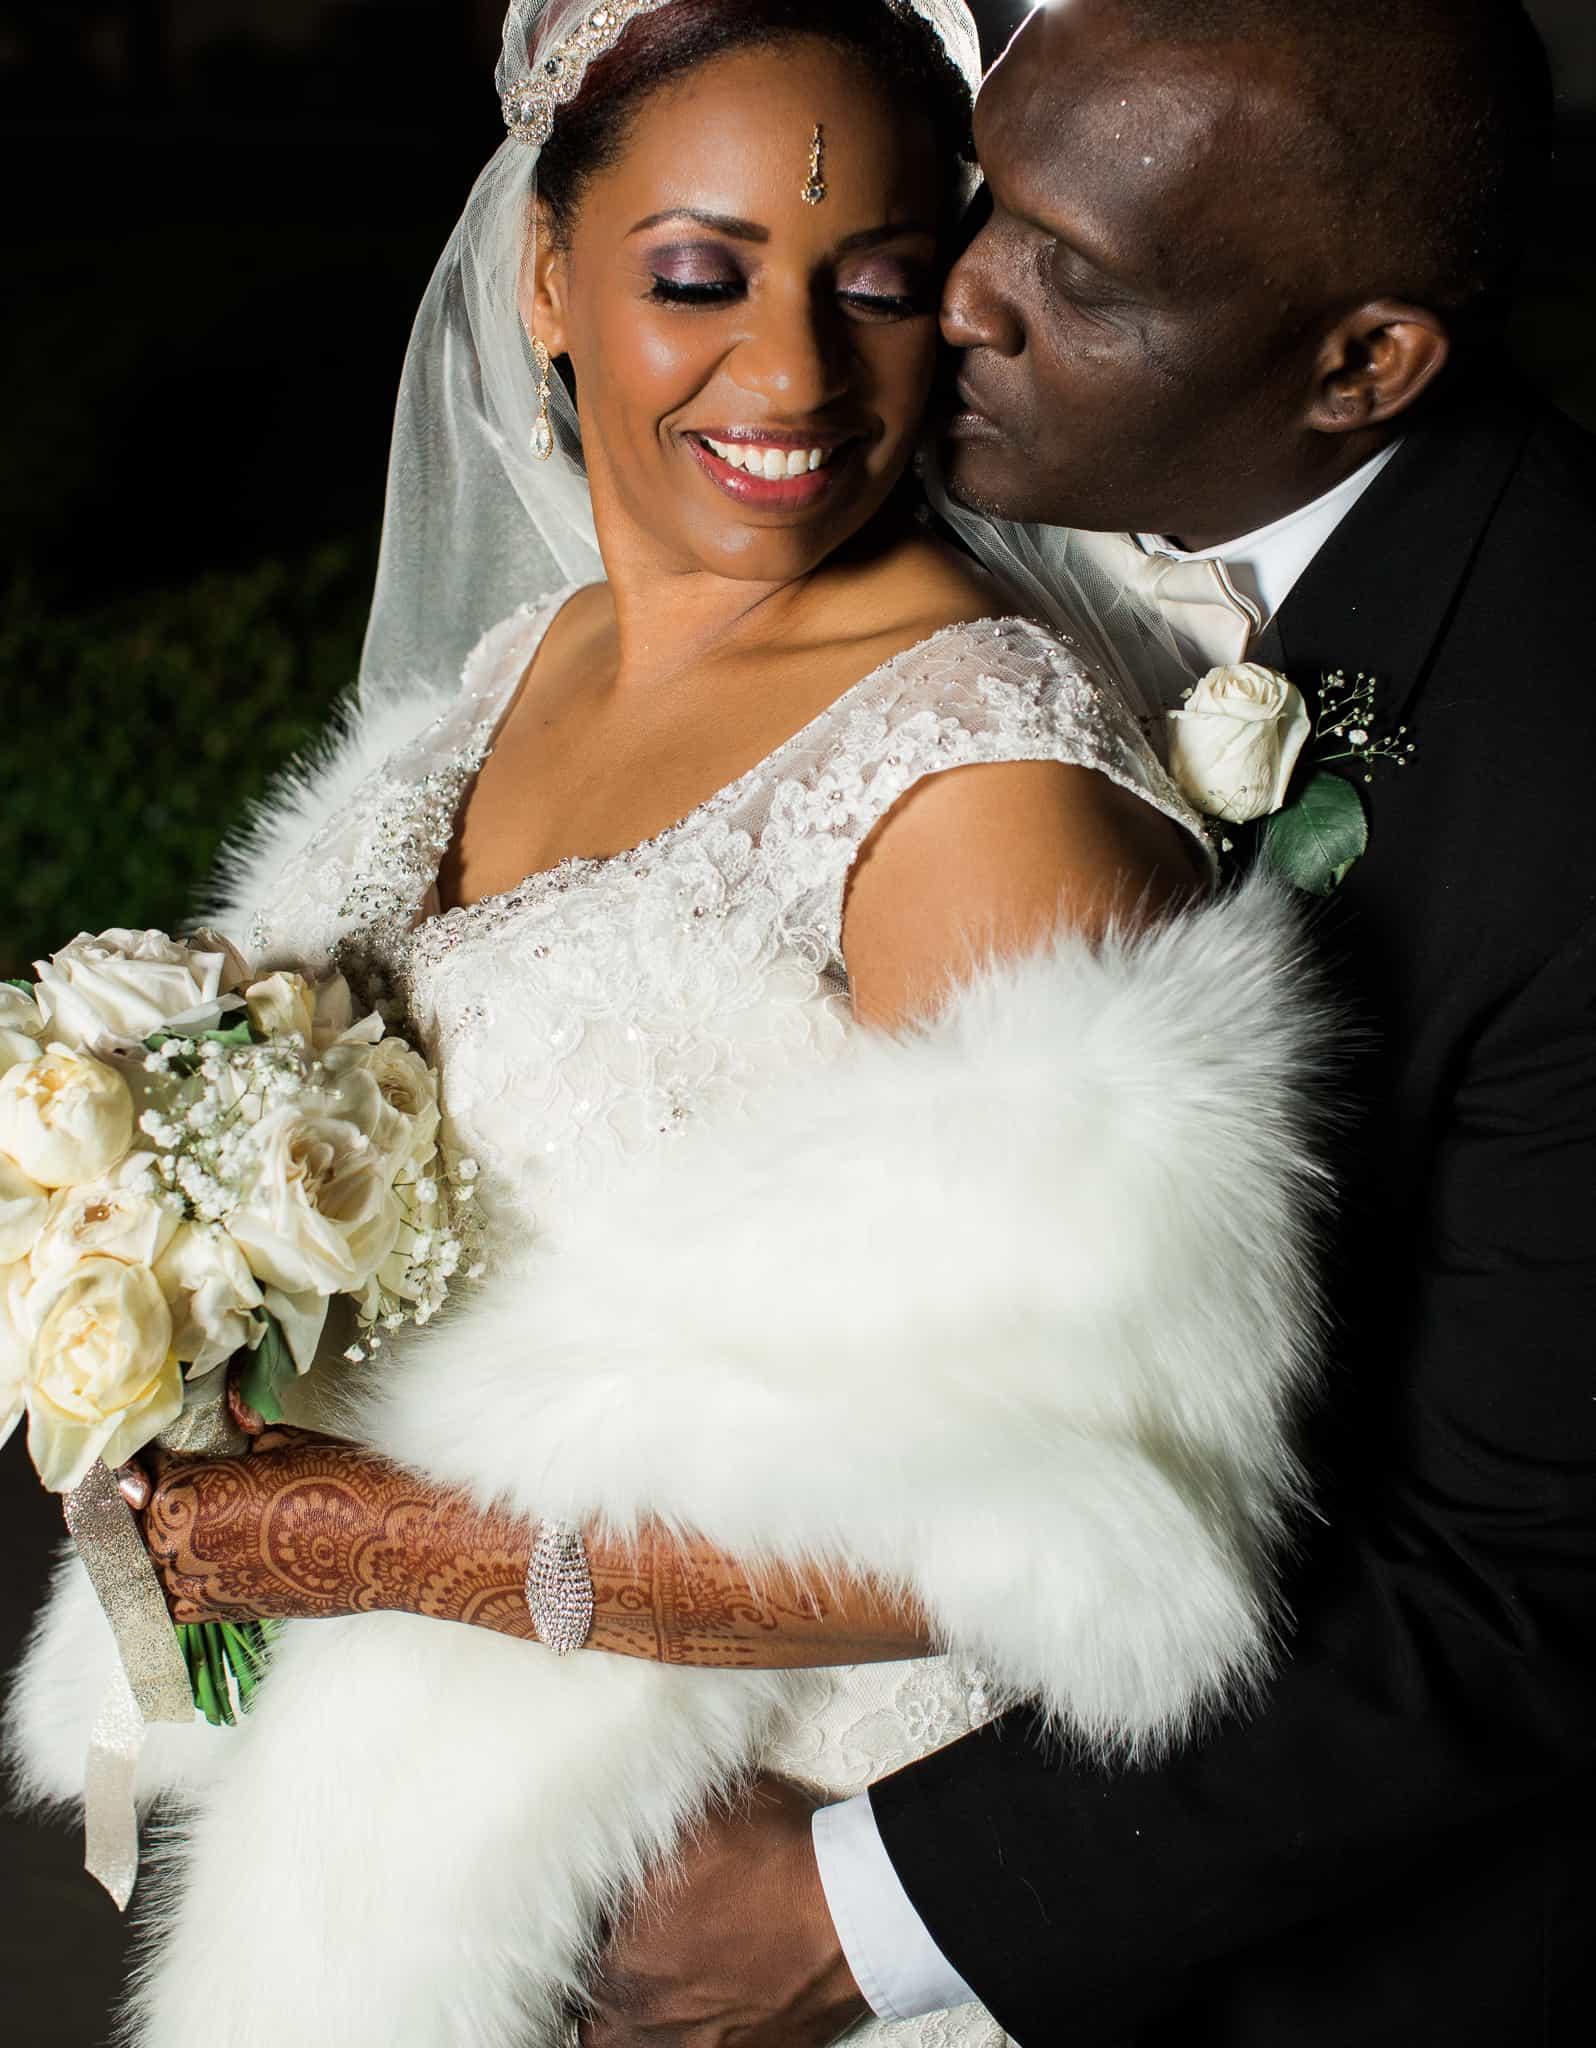 Green Weddings Archives - Black Nuptials